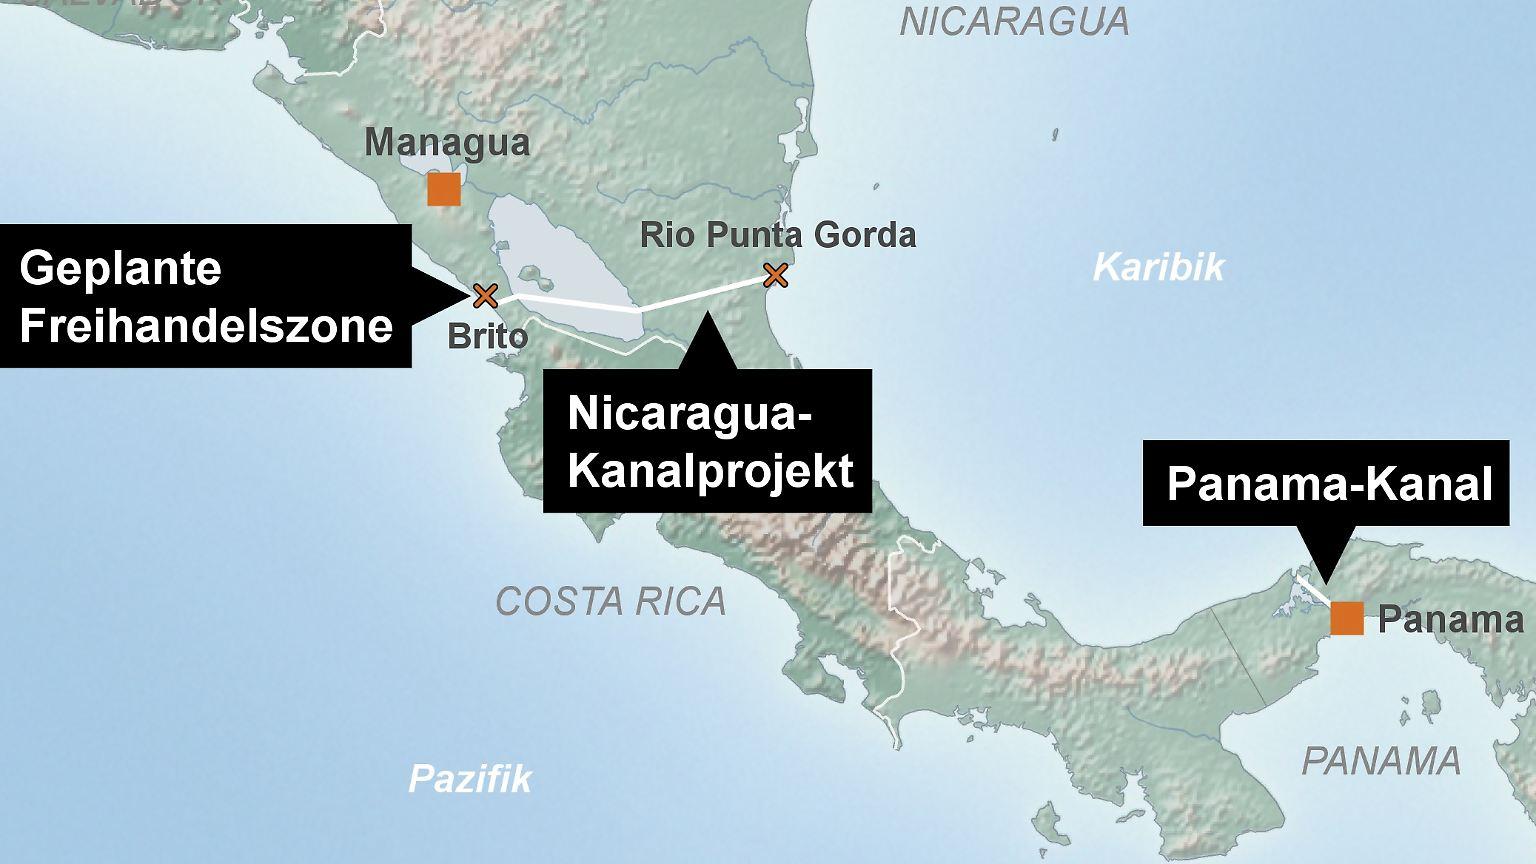 Konkurrenz Fur Panama Kanal Route Fur Nicaragua Kanal Steht N Tv De